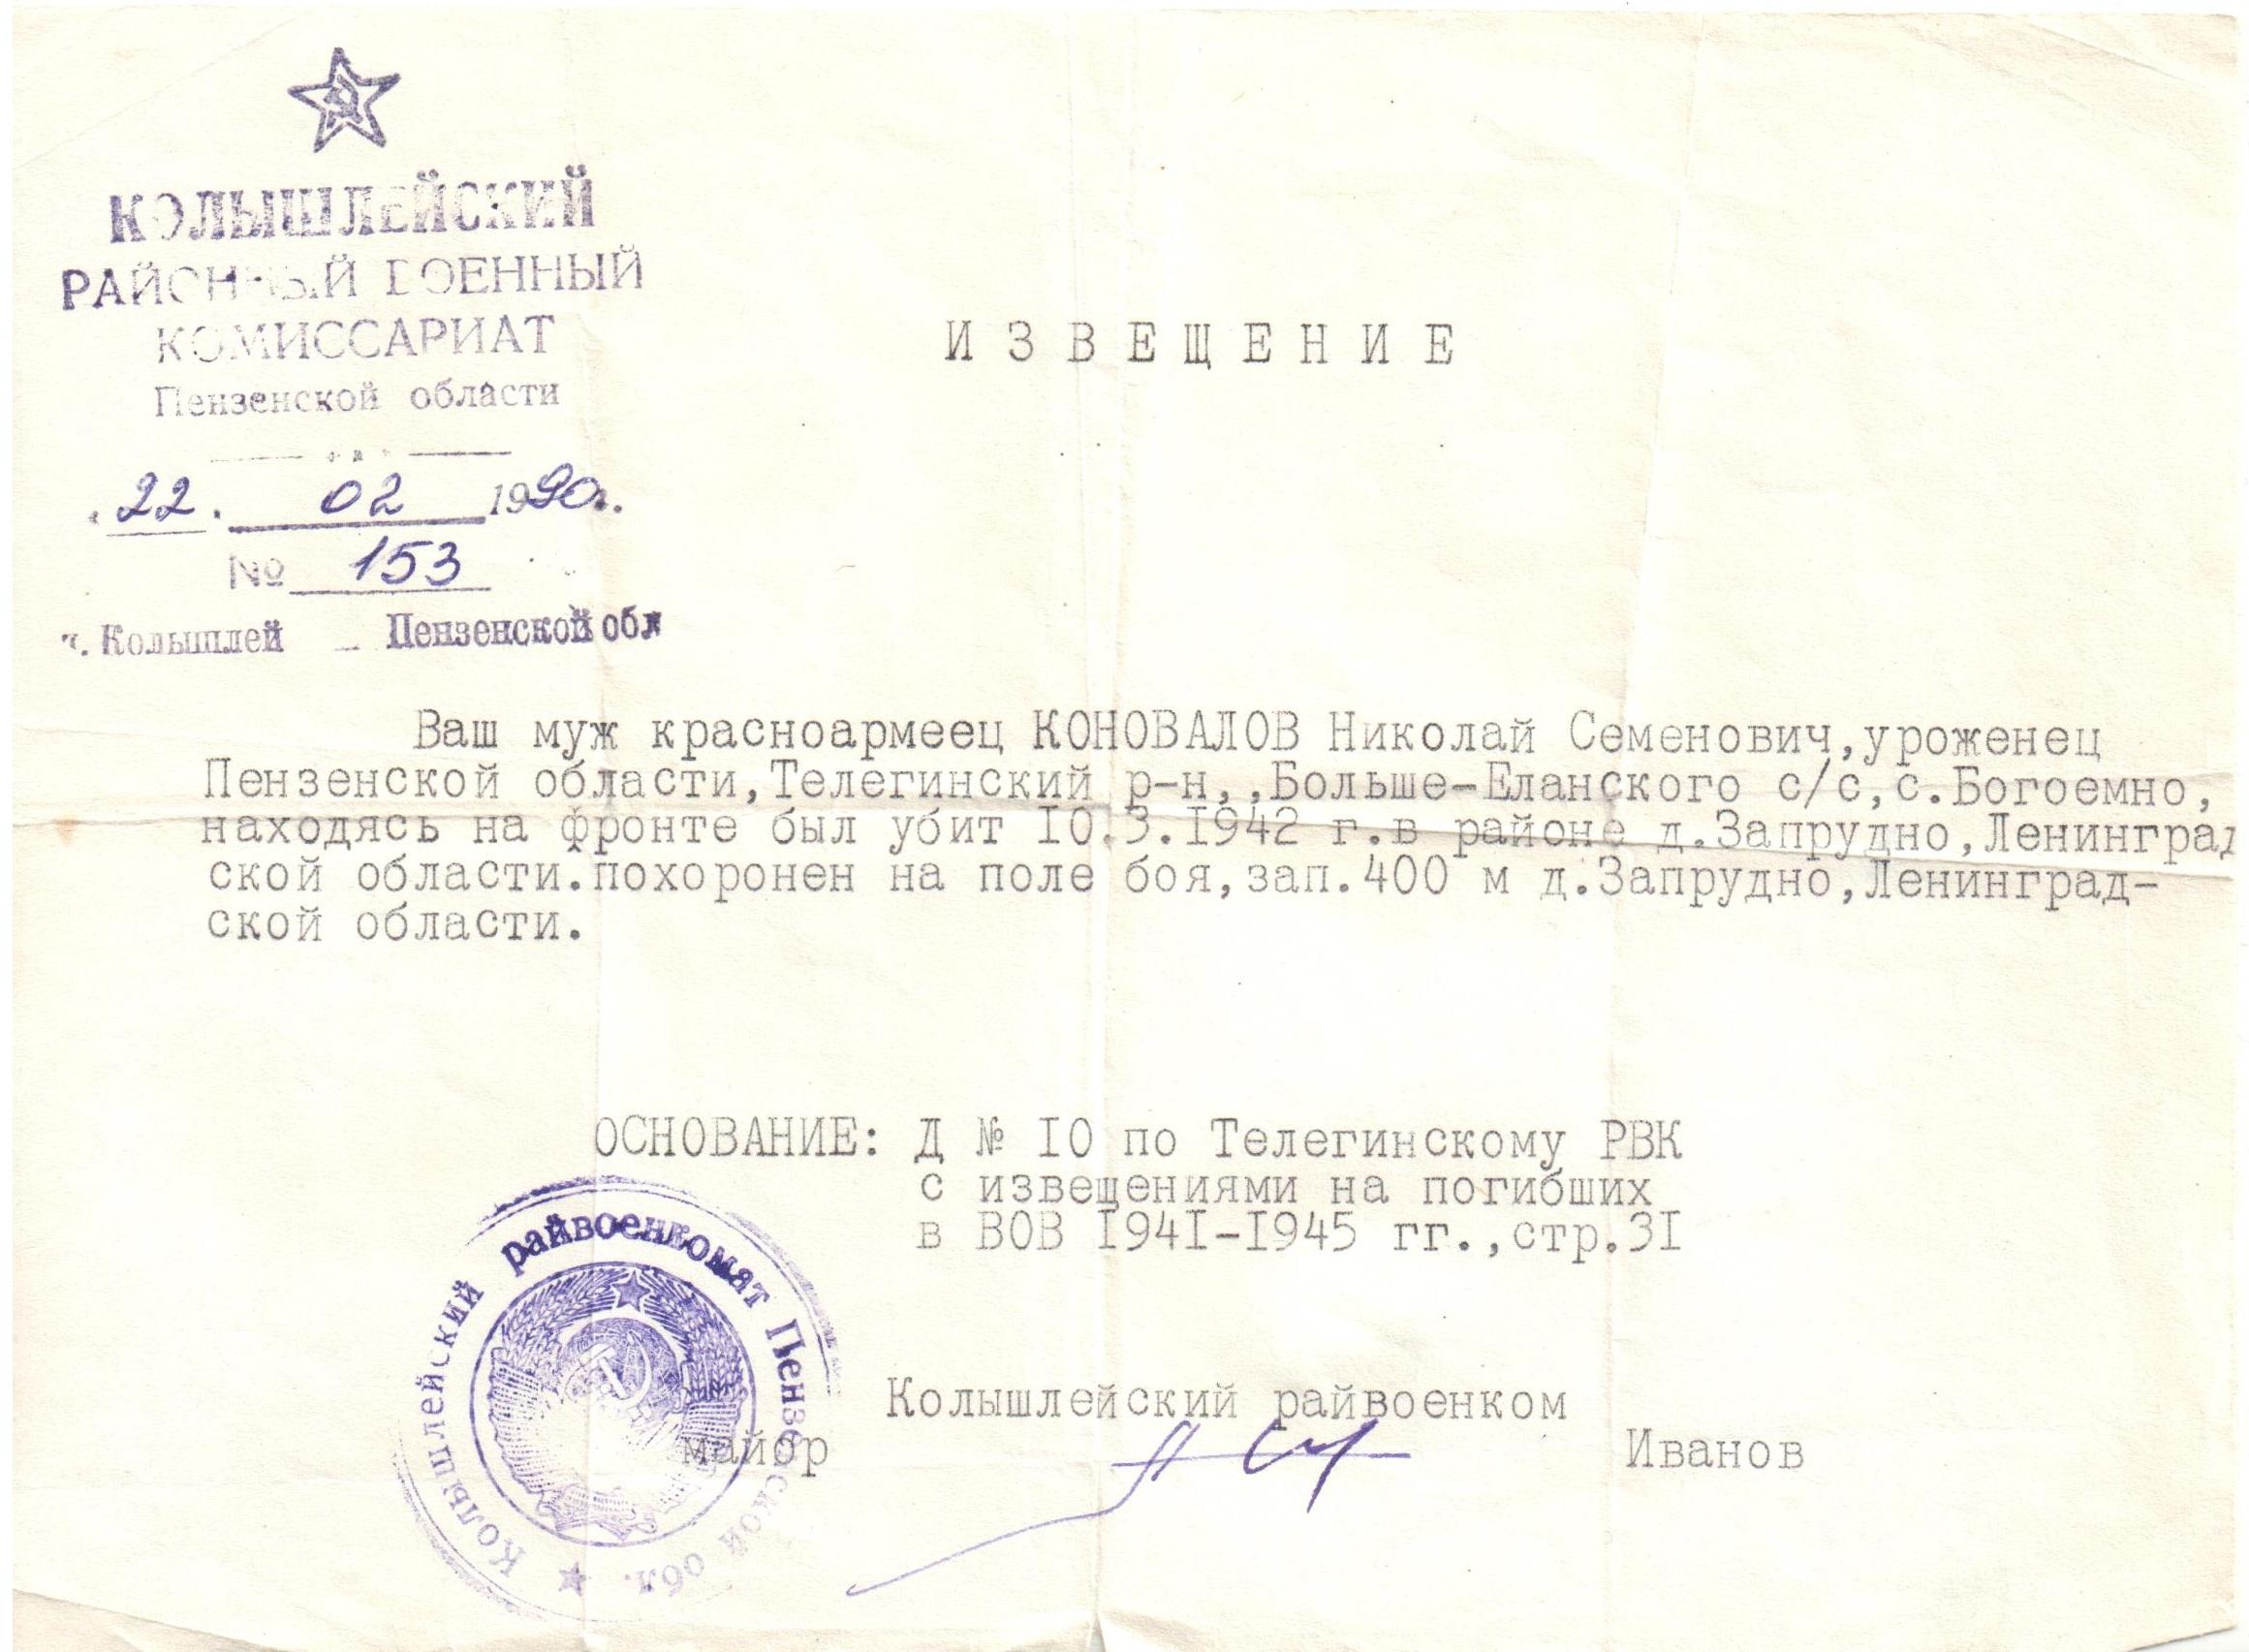 Коновалов Николай Семенович. Извещение на погибшего. Из архива Бородина П. А.